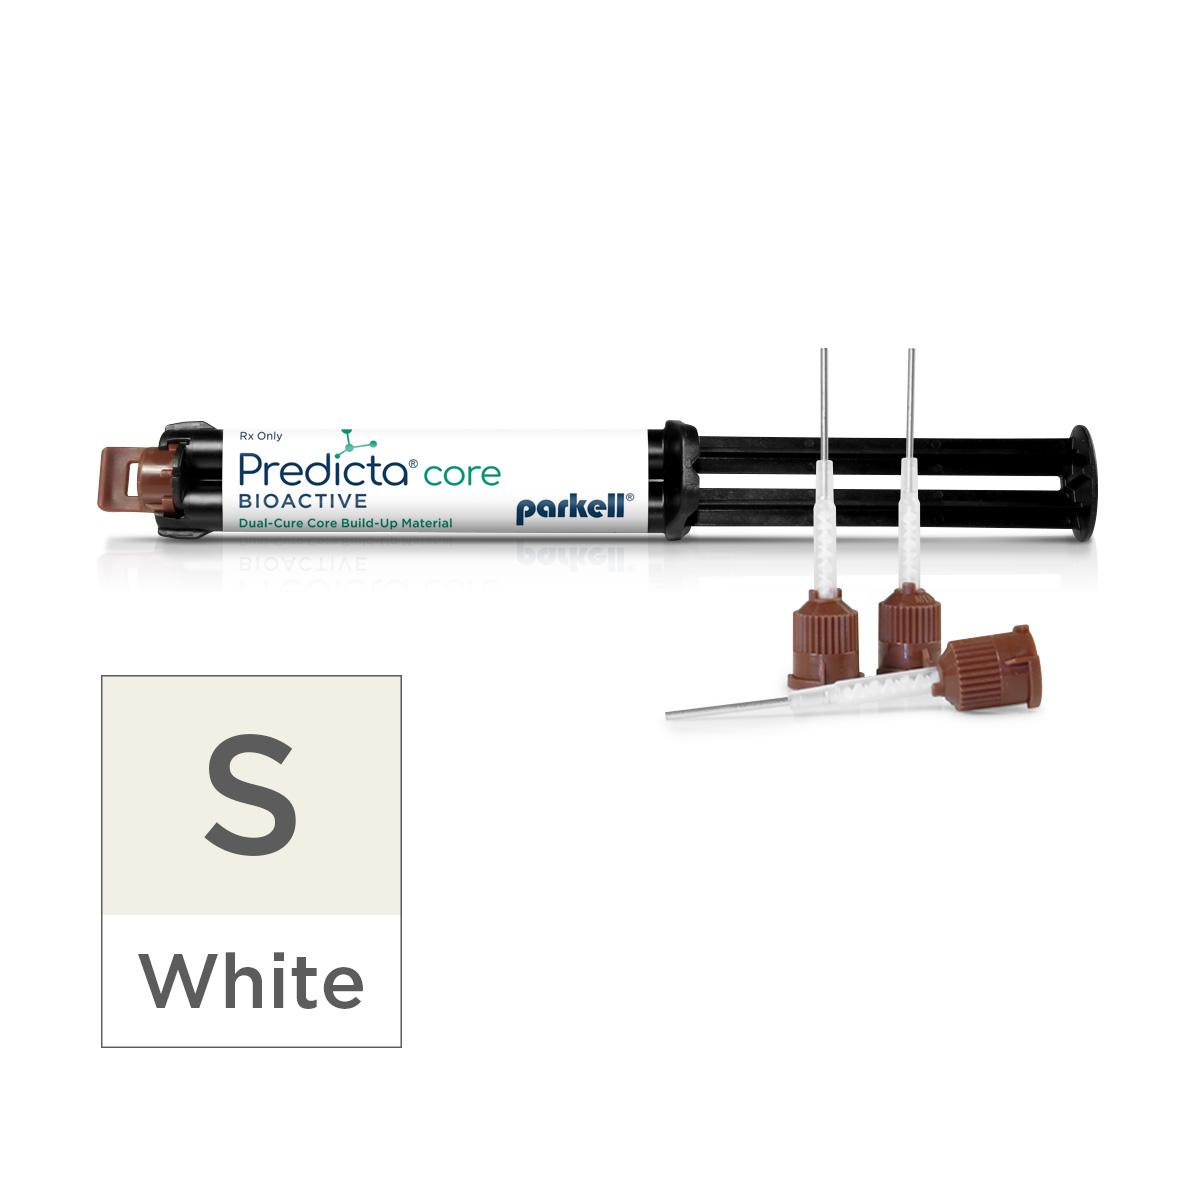 Predicta Bioactive Core box syringe